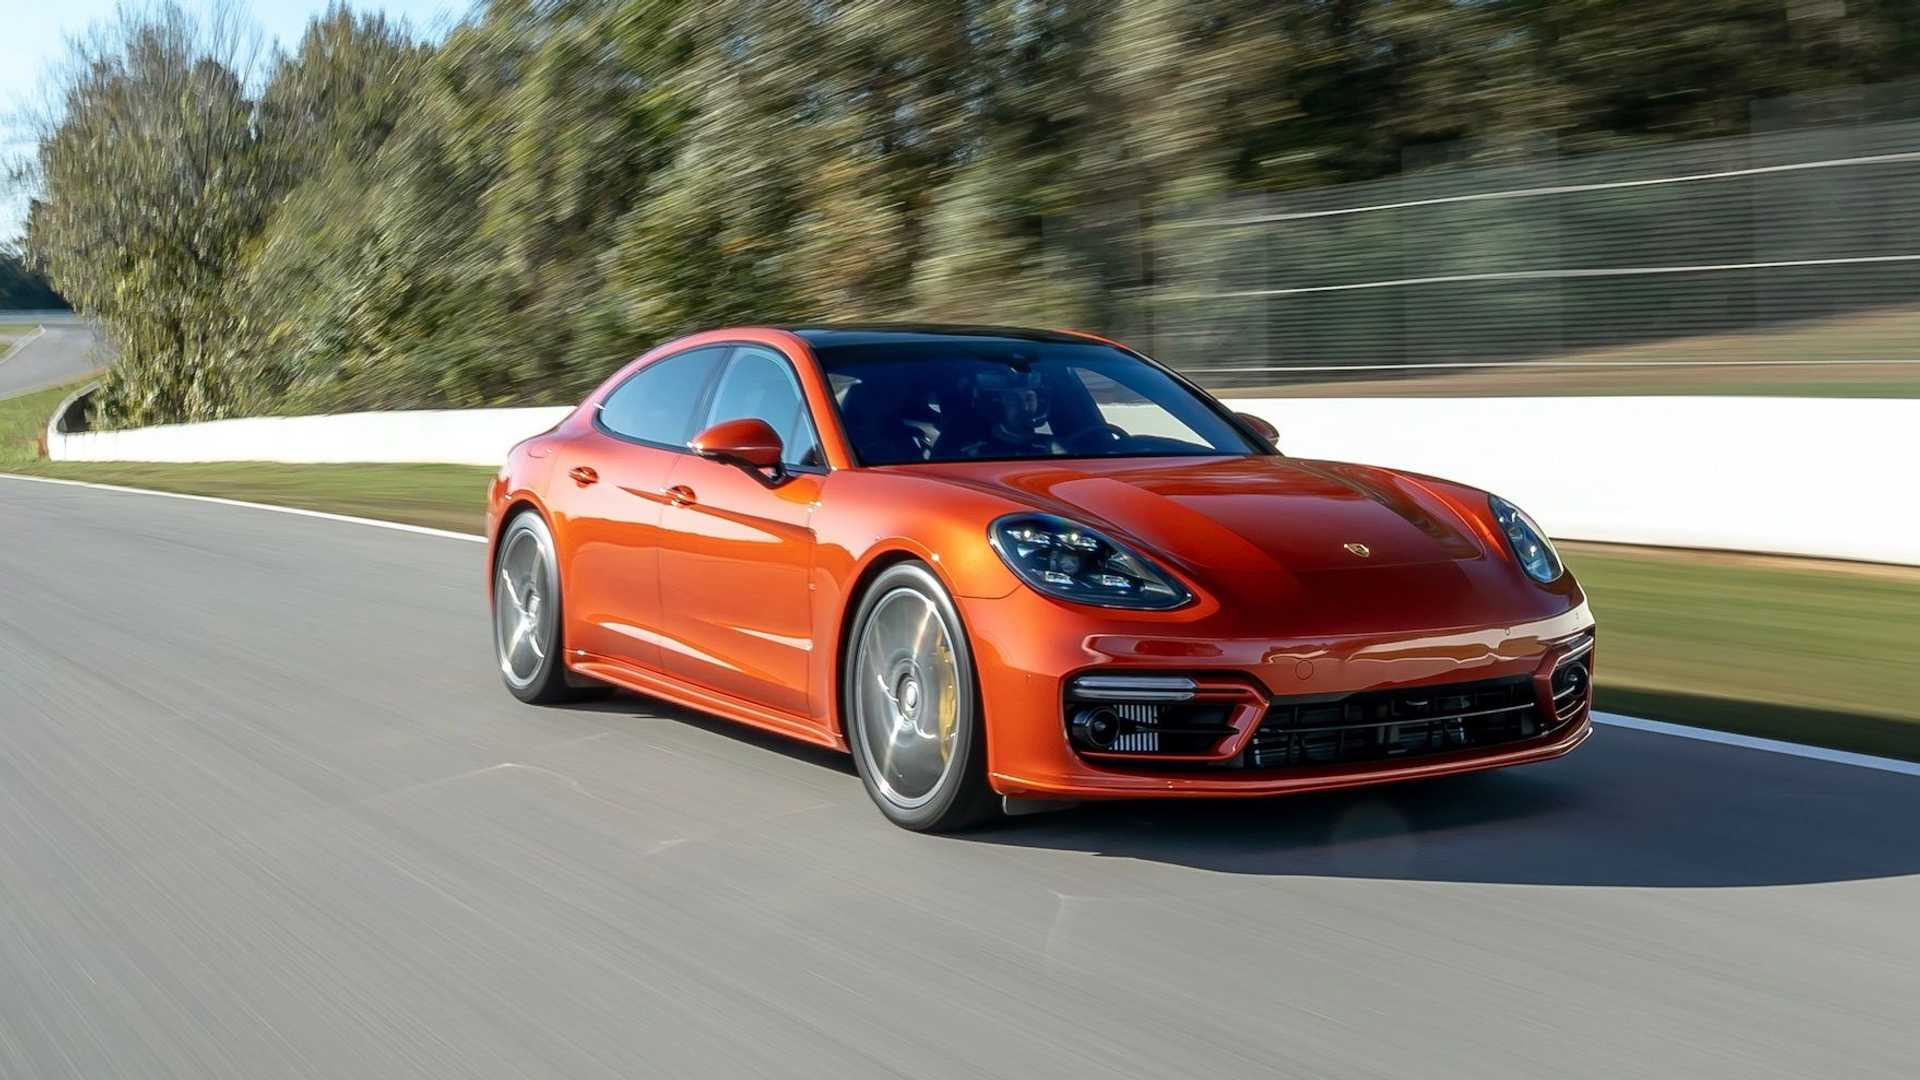 Porsche-Panamera-Turbo-Record-Road-Atlanta-7